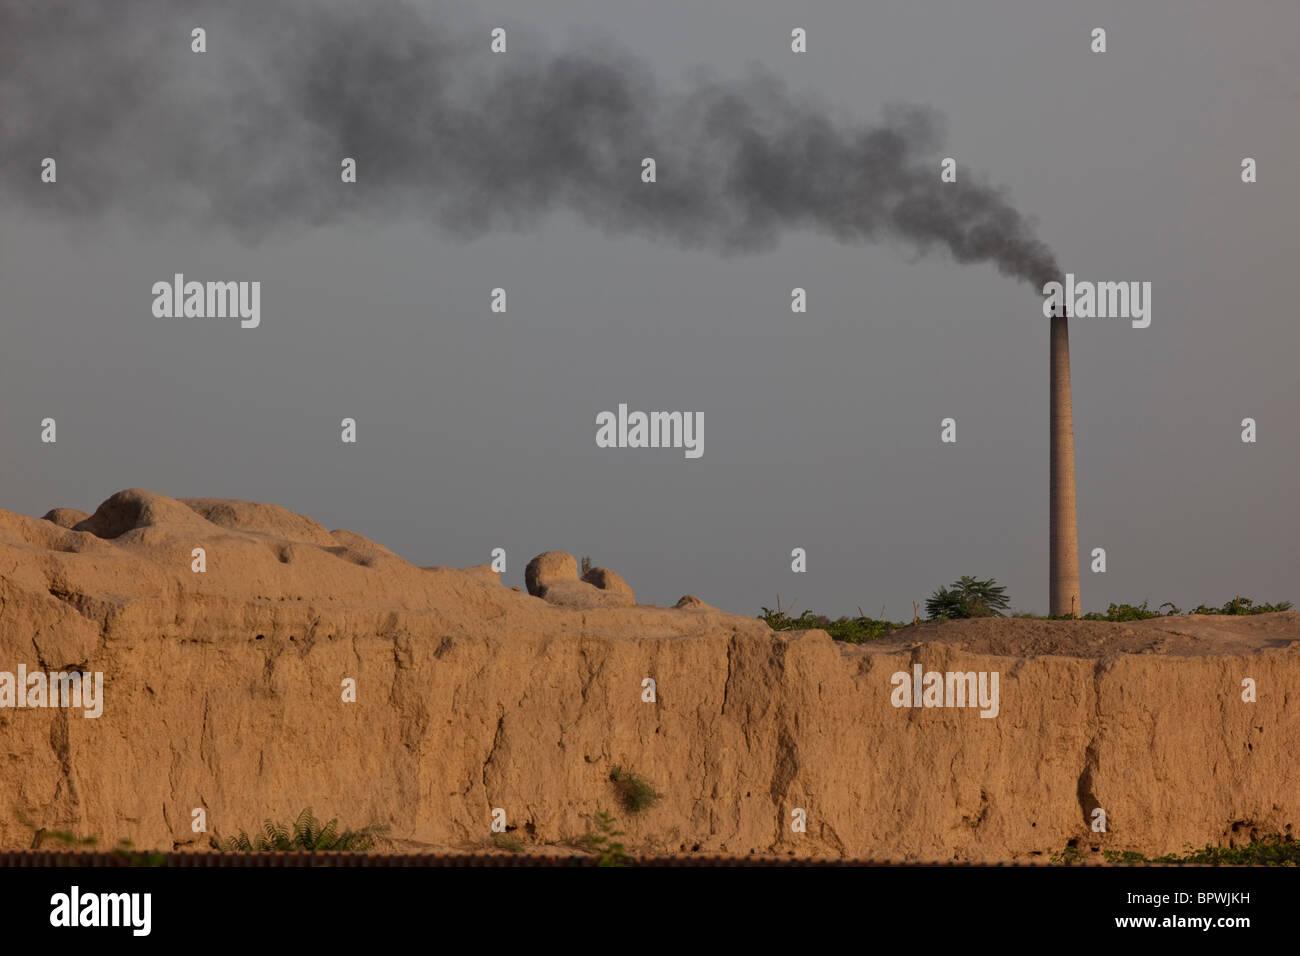 Smokestack in Turpan, Xinjiang, China. - Stock Image